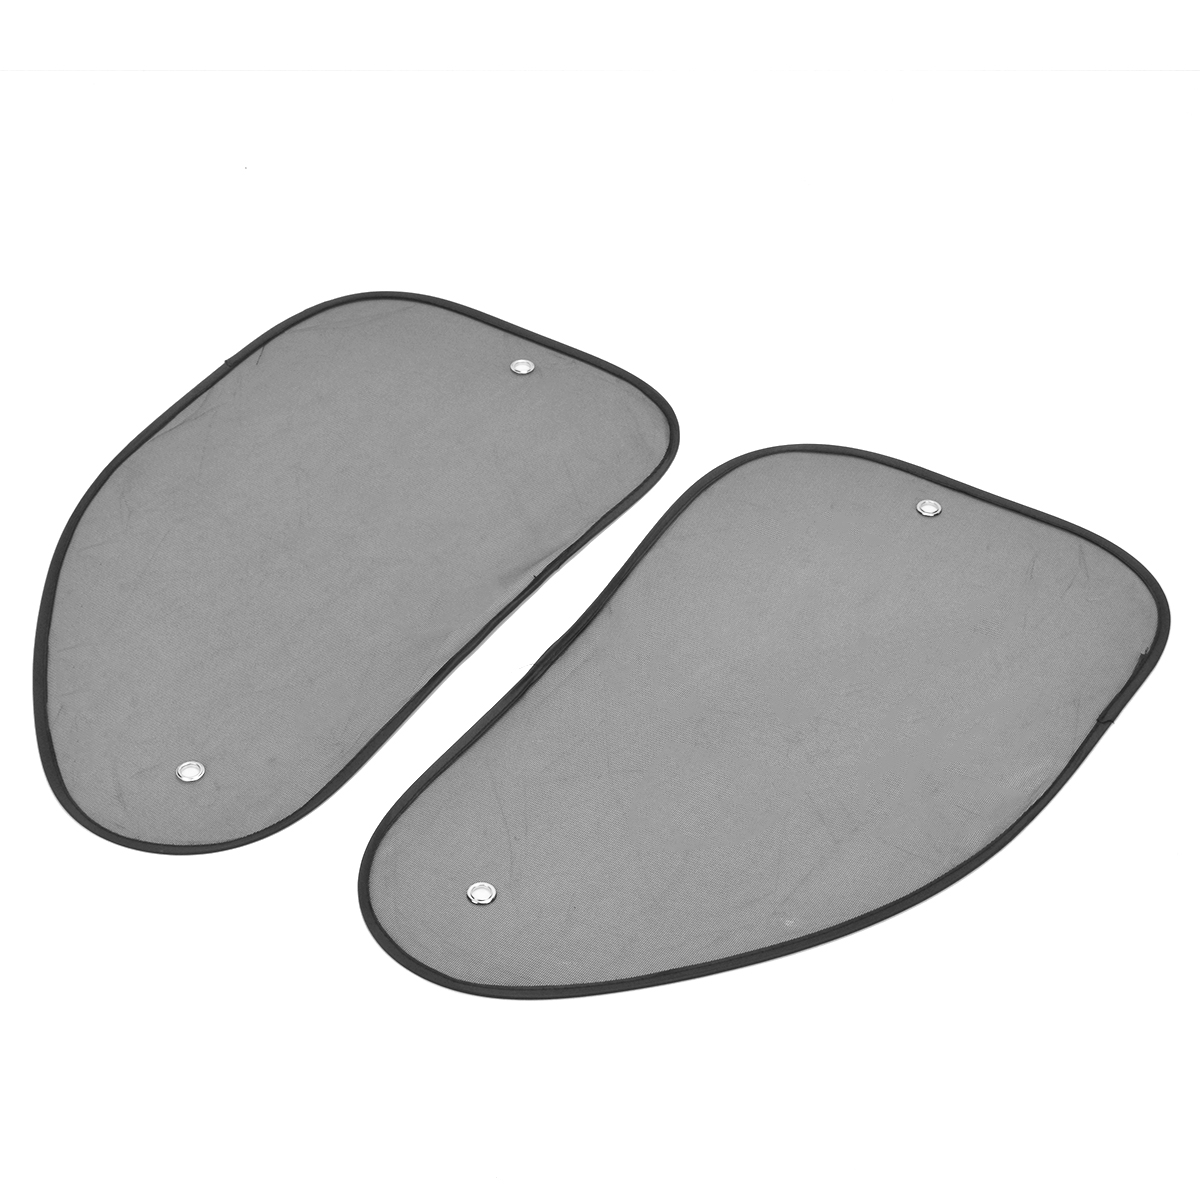 ebebb87157e6 1 Pair L&R Car Side Window Mesh Sun Shade Windshield Visor Cover Shield  Sunshade UV Protector